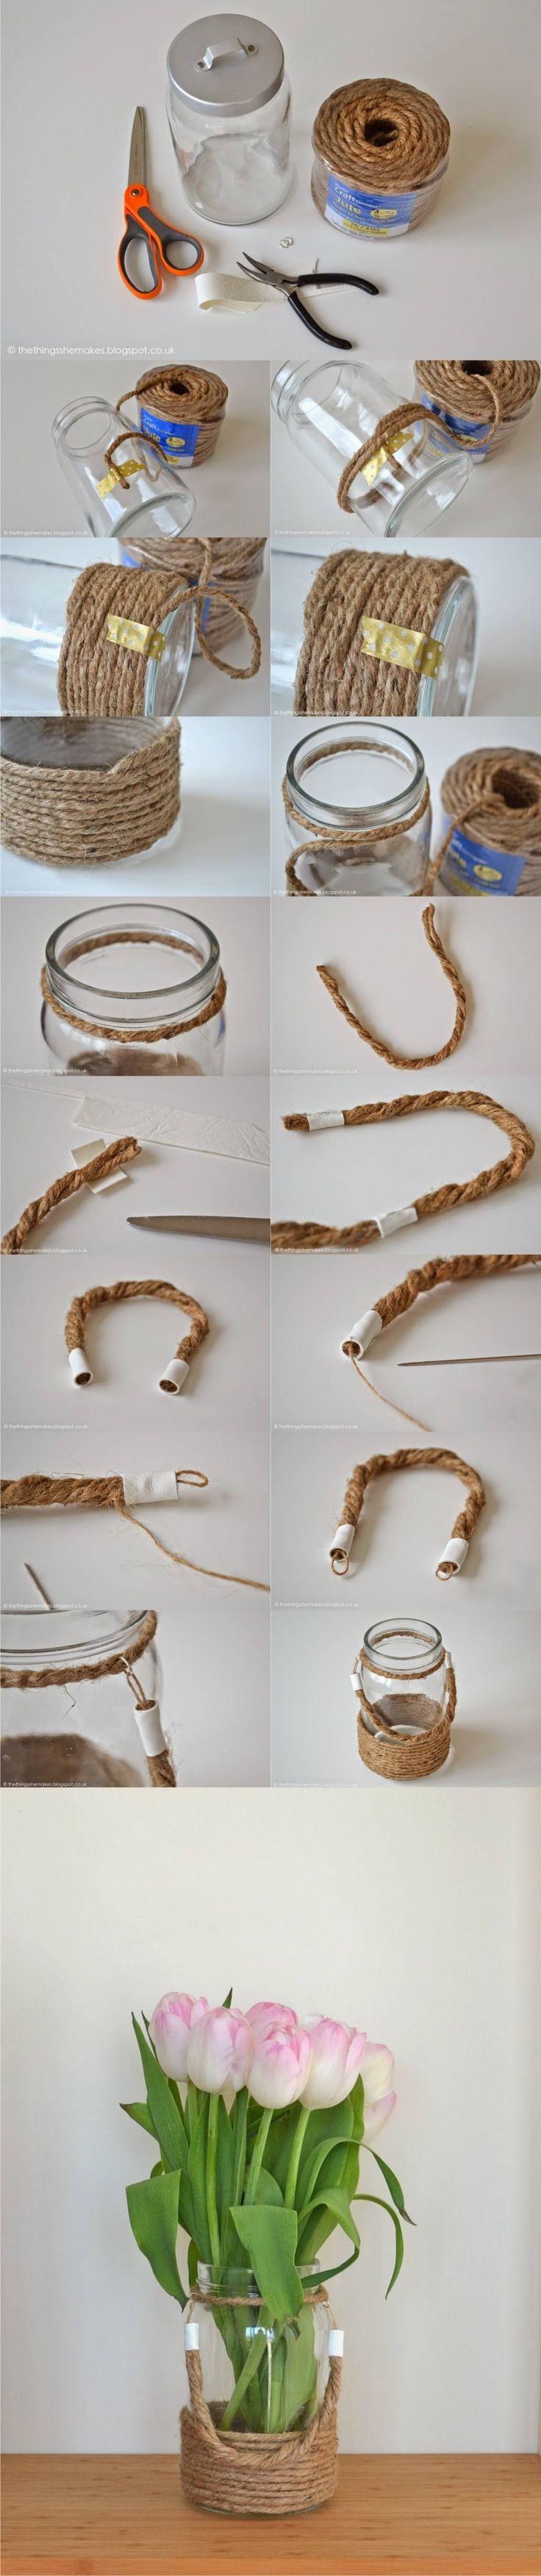 Florero con tarro y cuerda - thethingsshemakes.blogspot.com - DIY Rope Wrapped Mason Jar